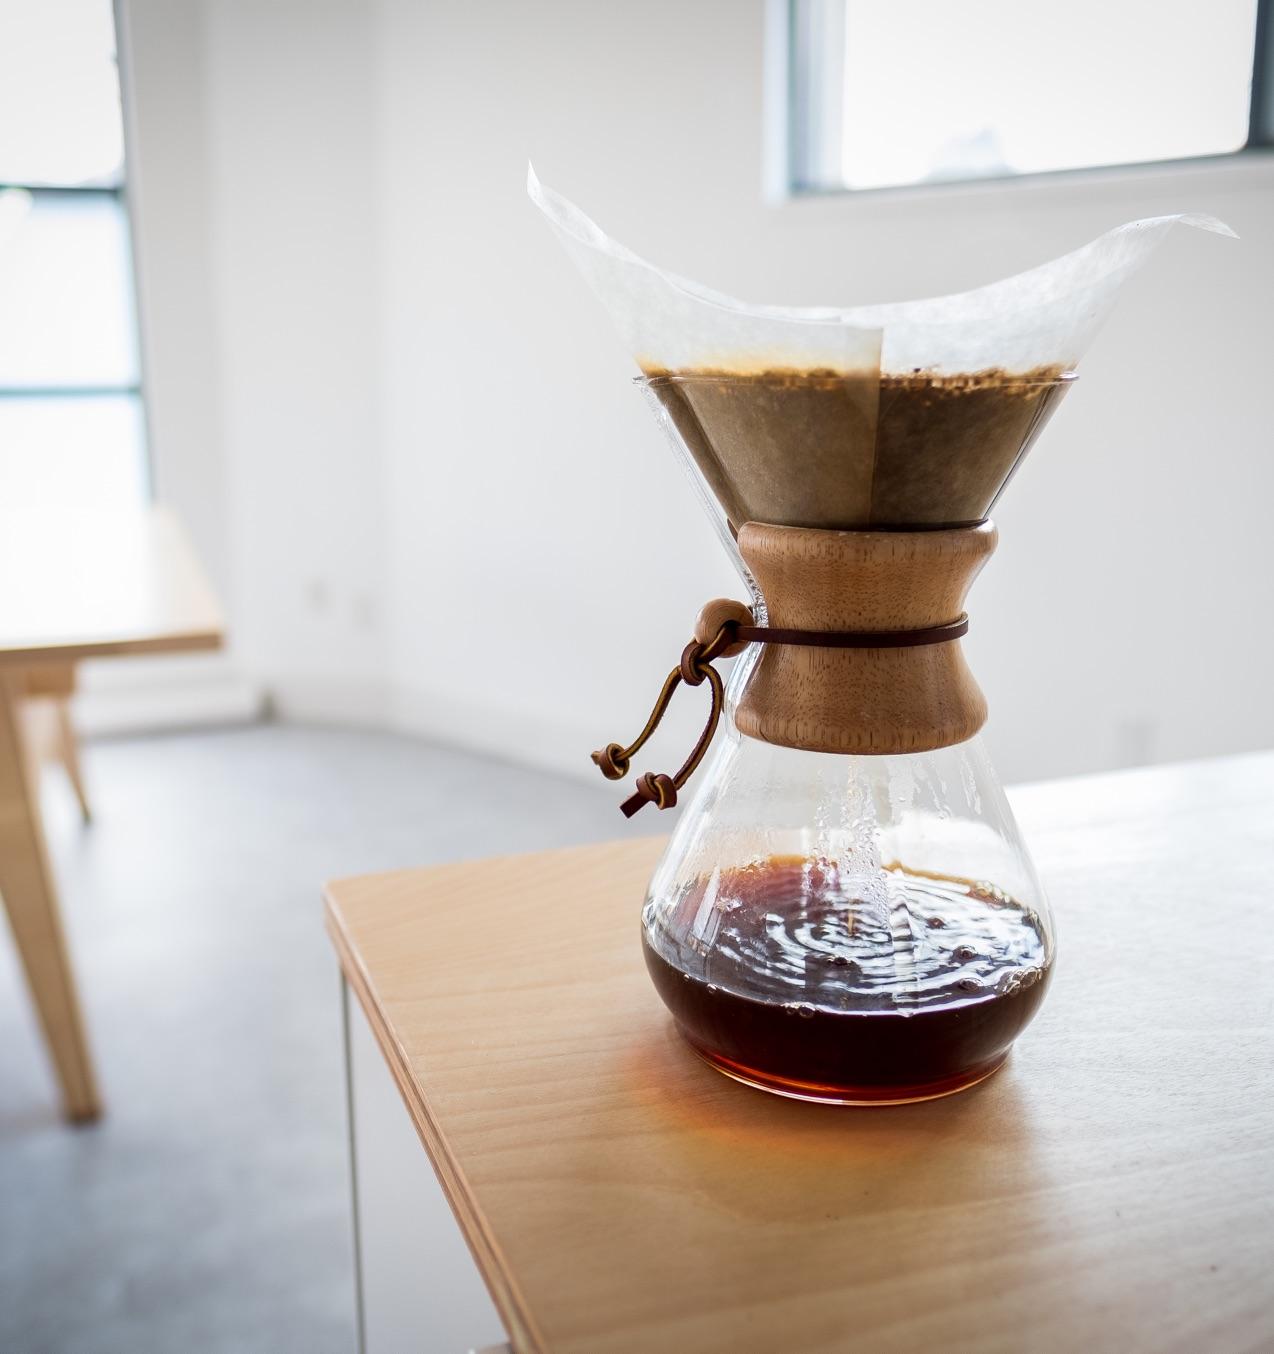 Cemex coffee pot brewing fresh artisinal coffee in the Input Logic kitchen.